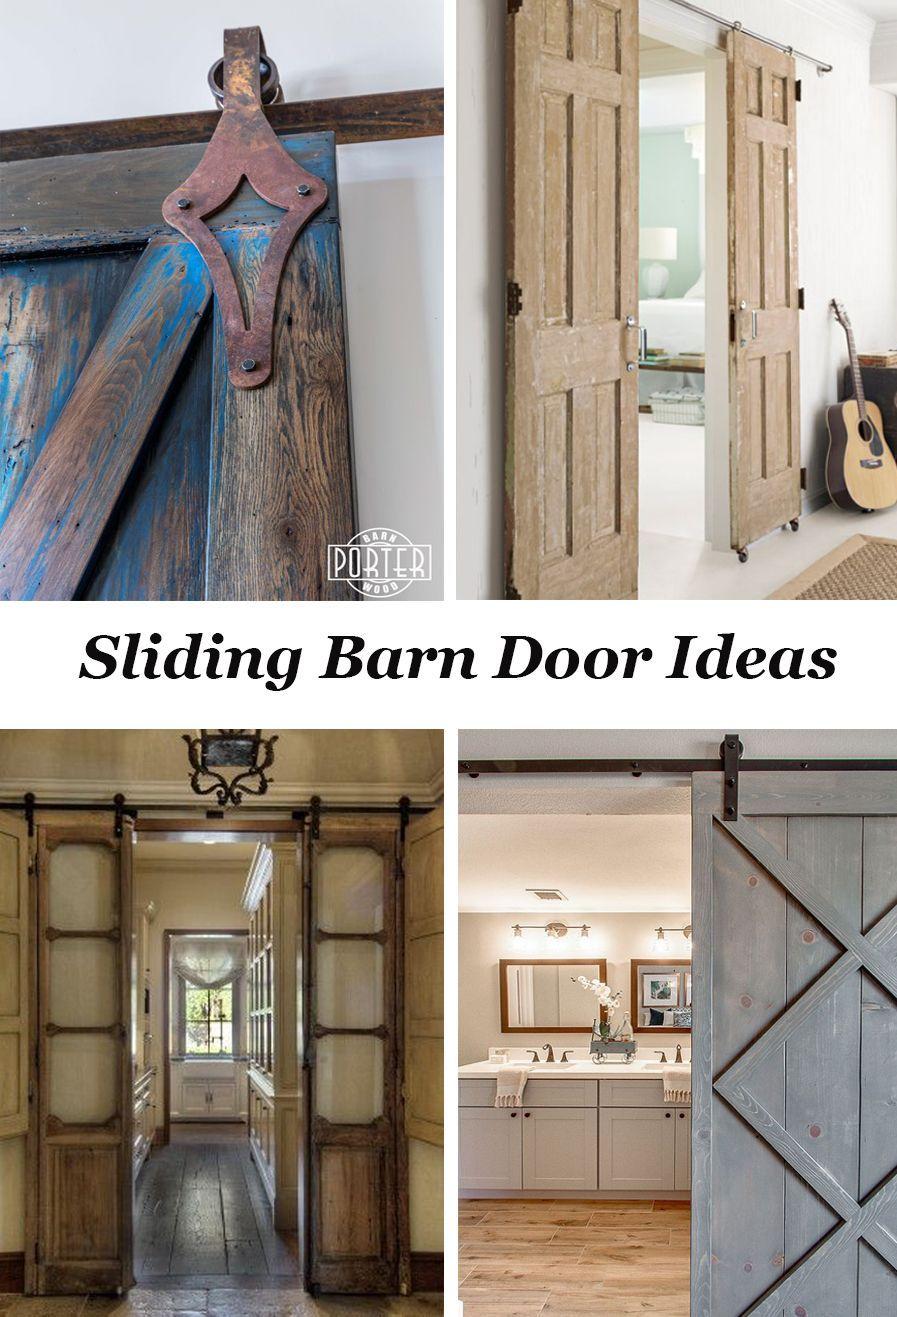 Lots of ideas for sliding barn doors and door hardware! | Interior ...